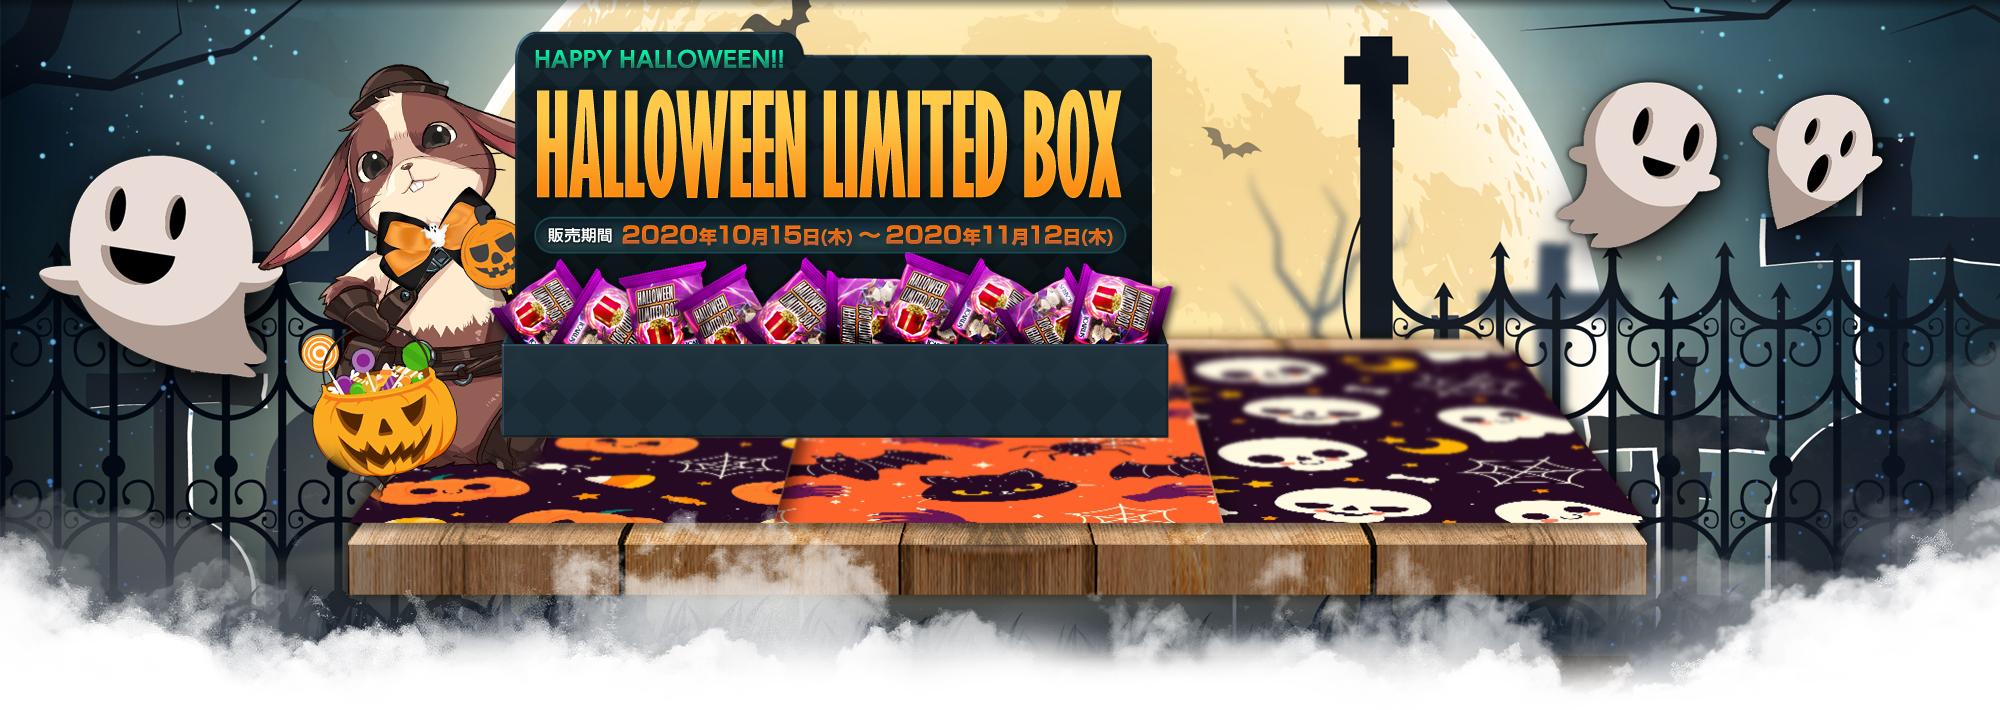 HALLOWEEN LIMITED BOX